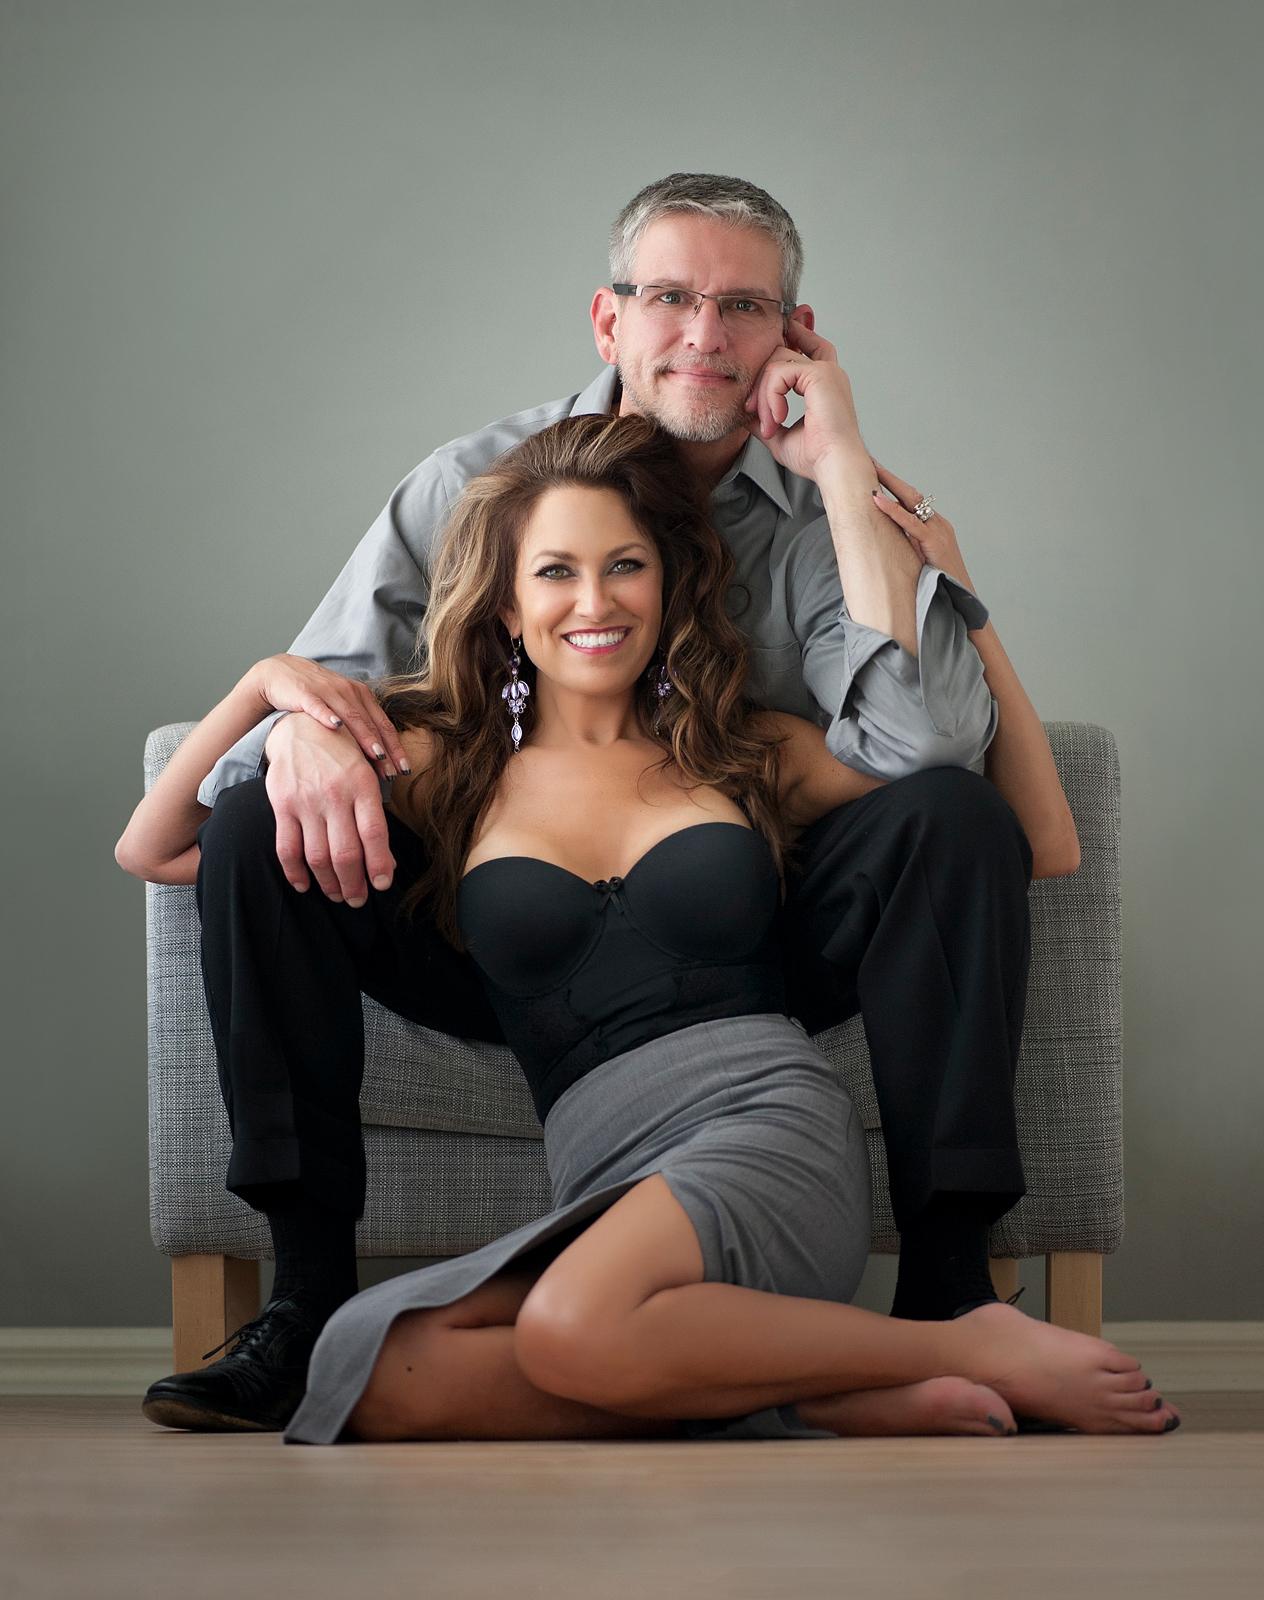 02-popular-couple-pose-seated-studio-wall-art.jpg